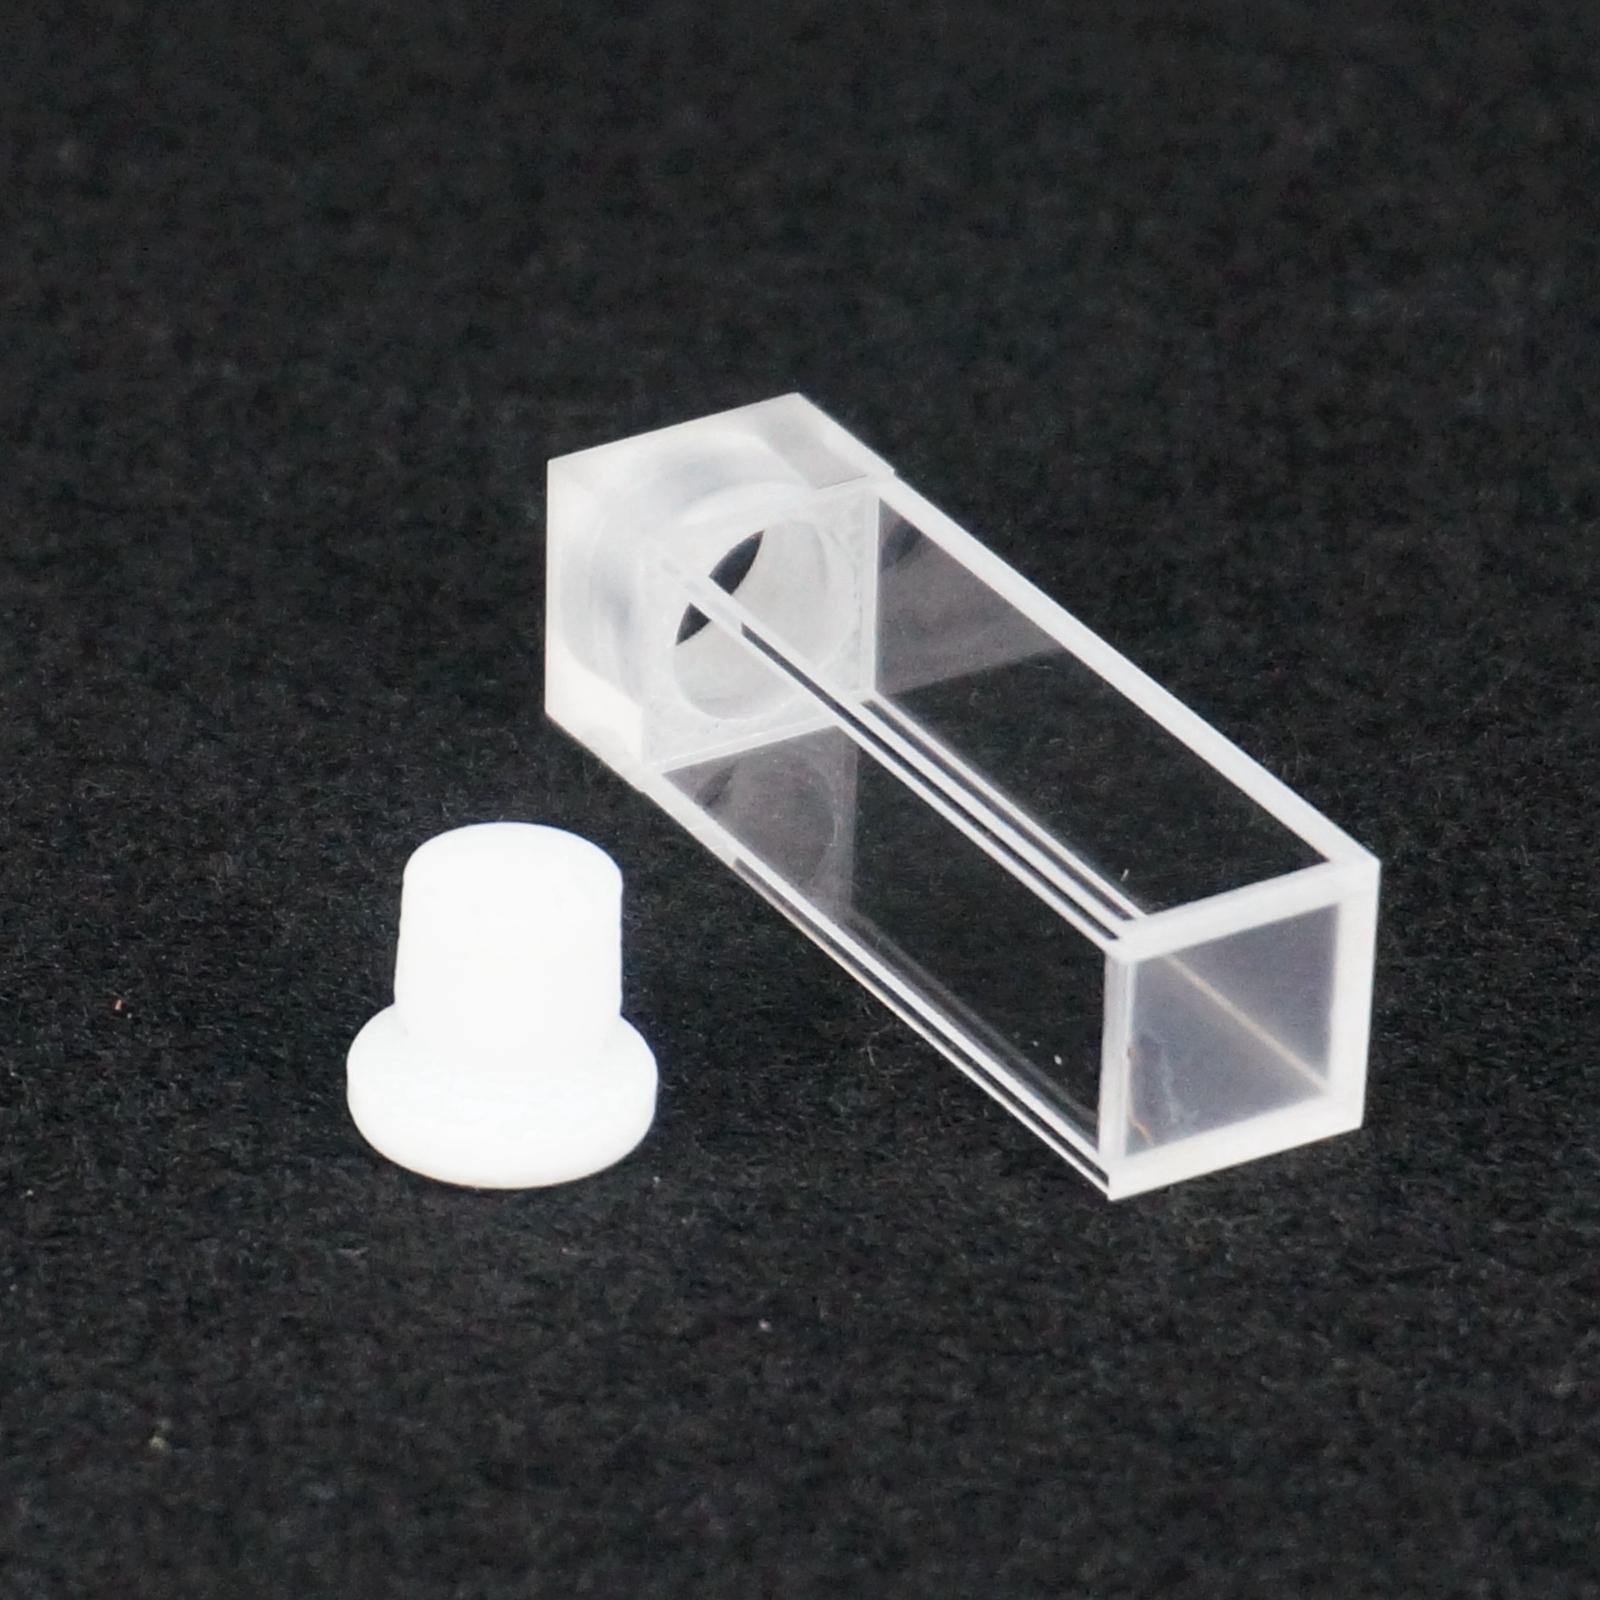 3.5ml 10mm Path JGS1 Quartz Cuvette With Stopper For Fluorescence Spectrometer3.5ml 10mm Path JGS1 Quartz Cuvette With Stopper For Fluorescence Spectrometer